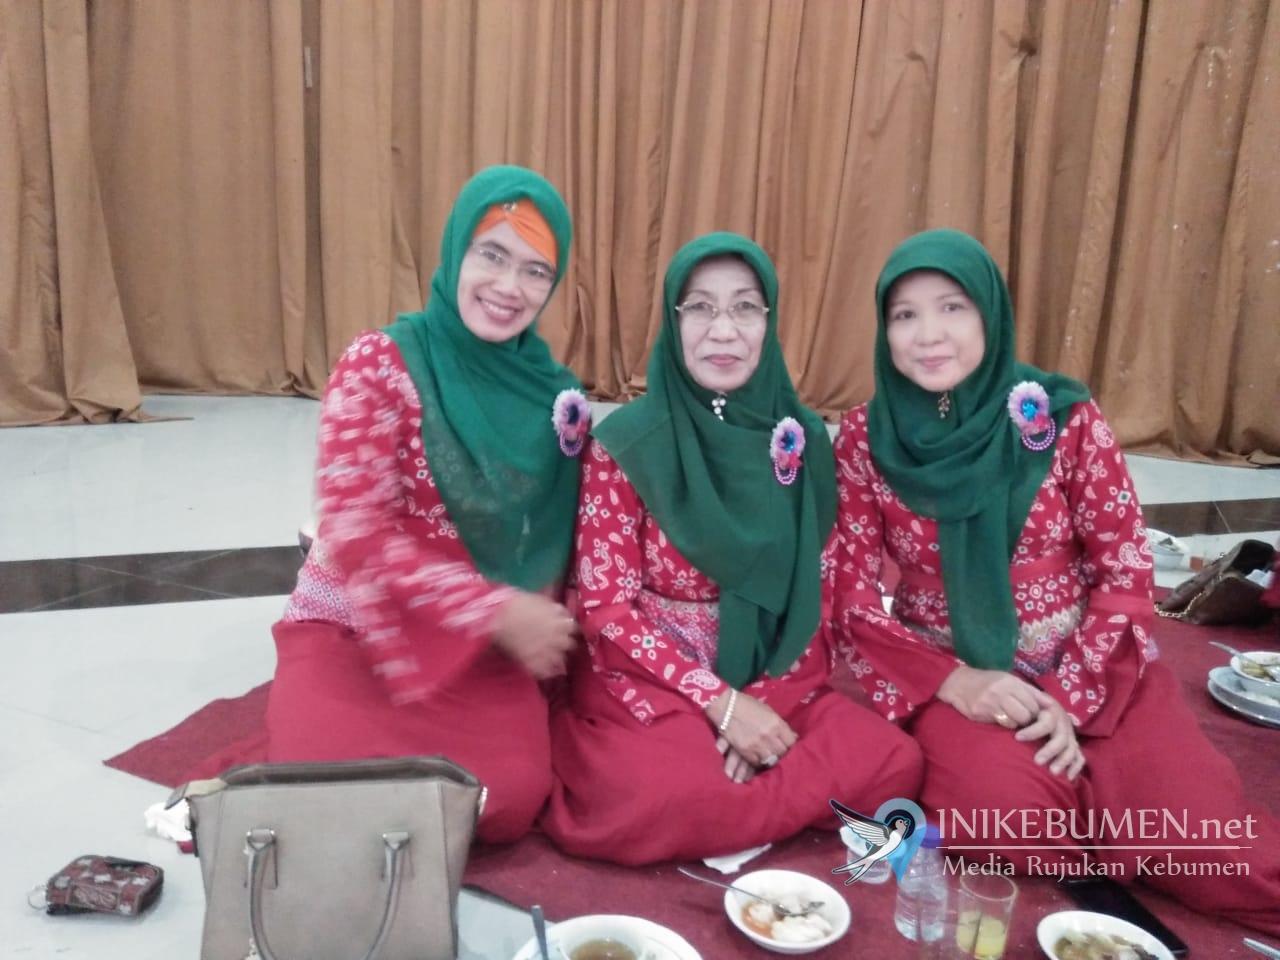 Nuryani Nashirudin, Istri Mantan Bupati Tetap Aktif Pimpin Grup Rebana